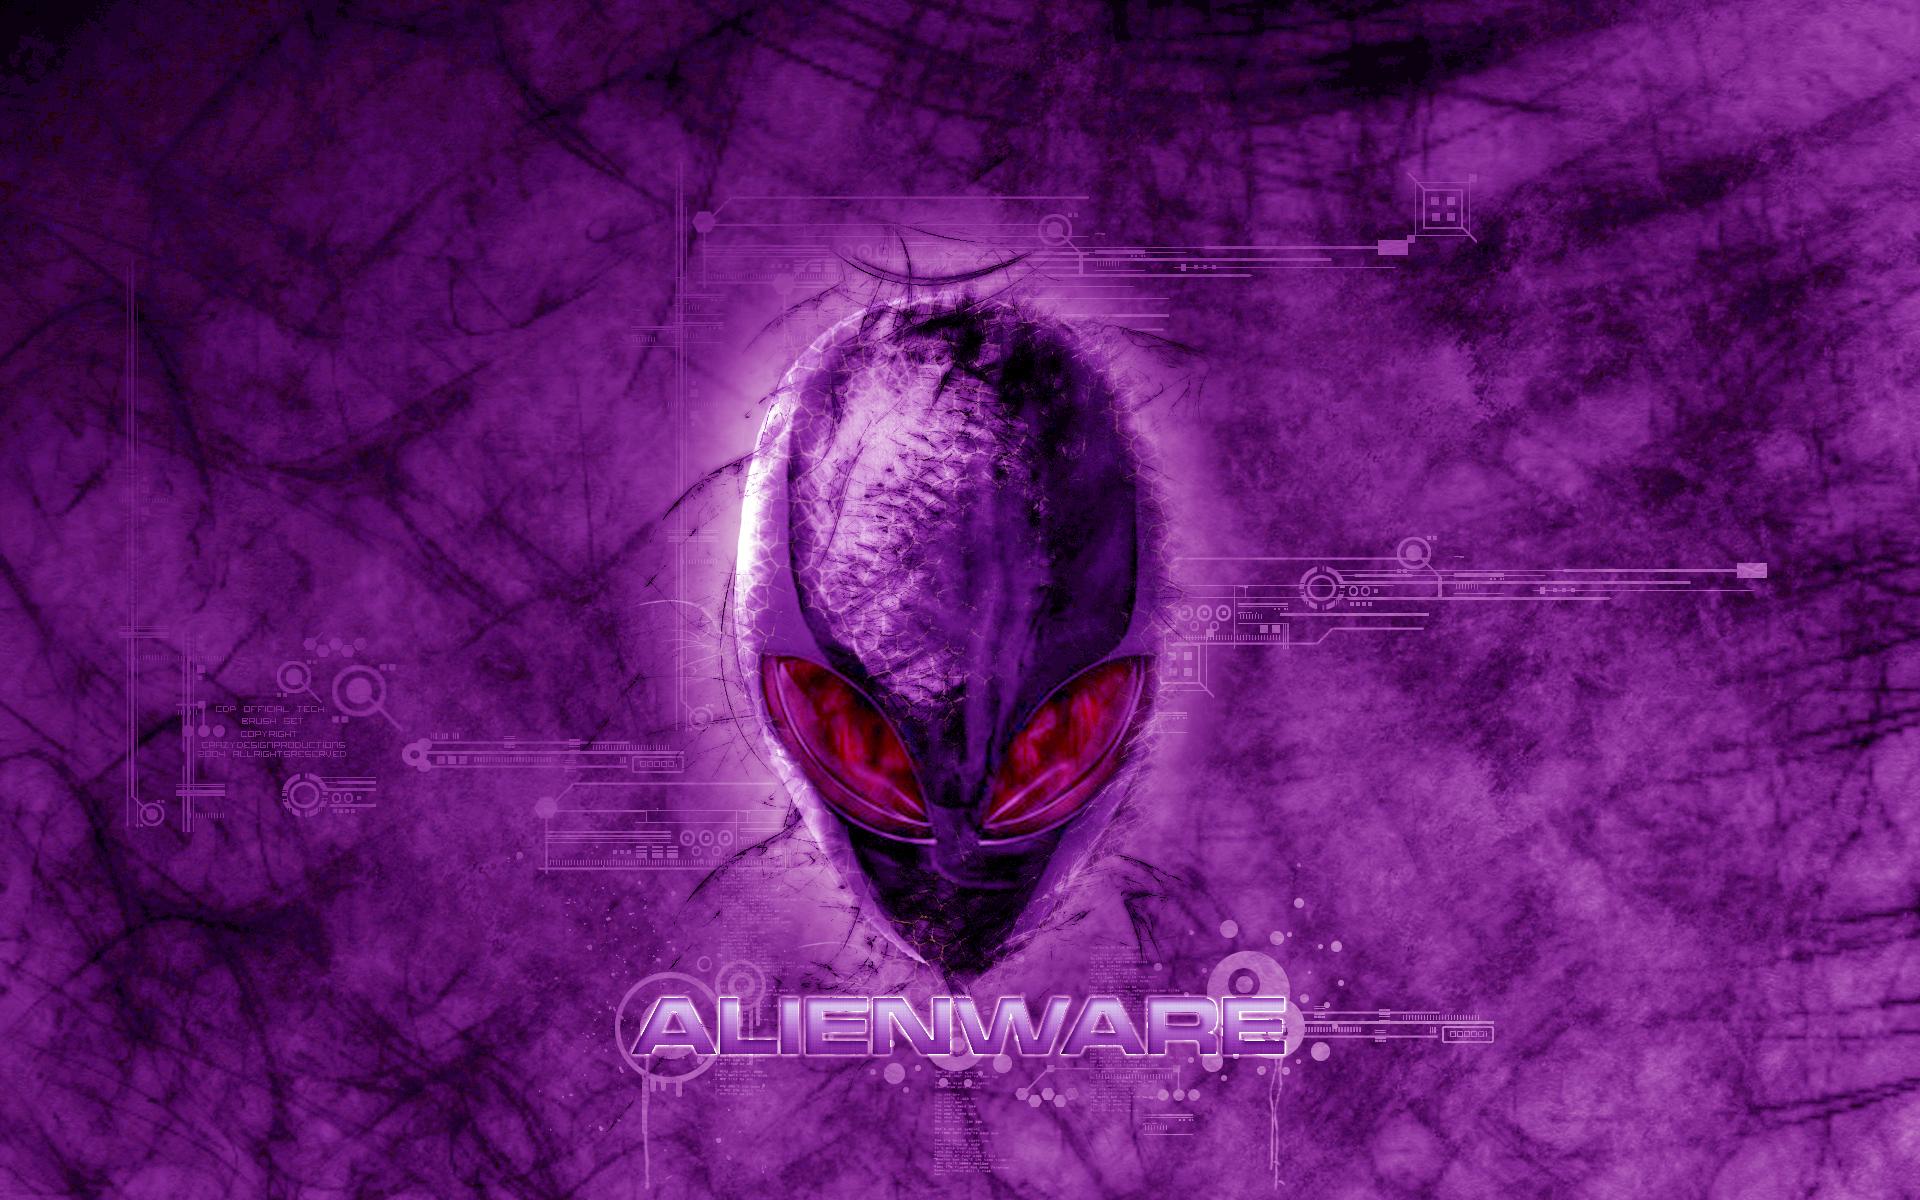 alienware hd wallpapers圖片